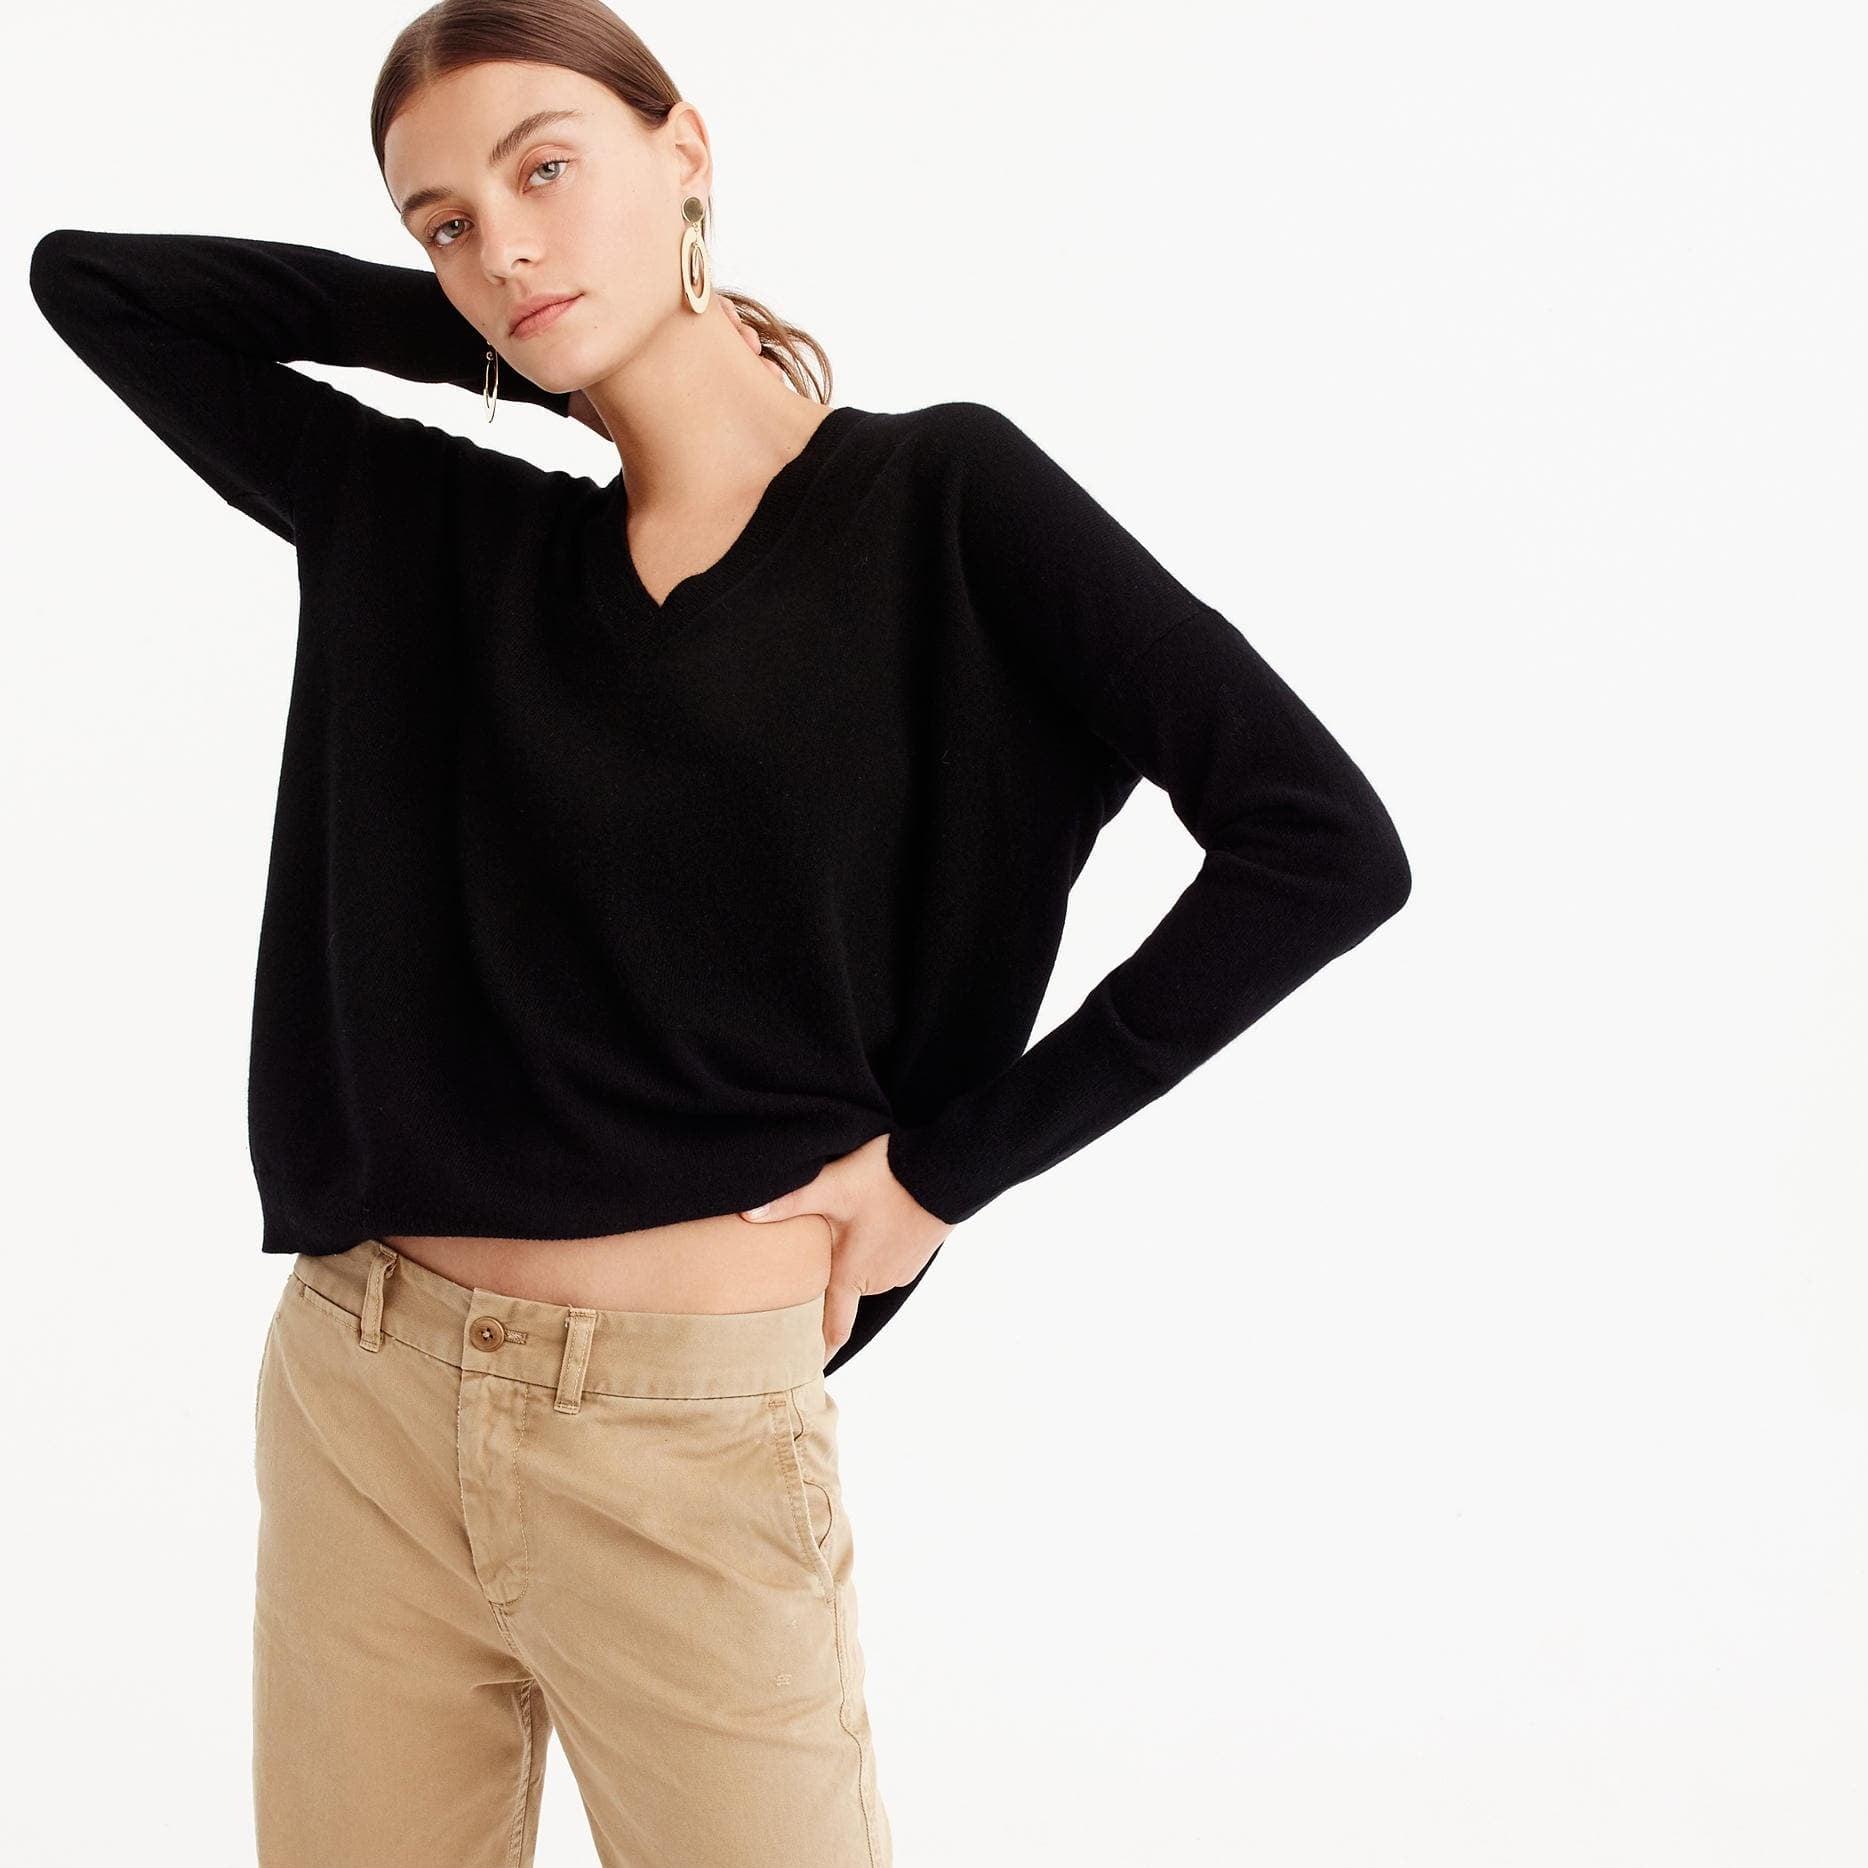 2928945c8ff1 J.Crew Cashmere Sweaters